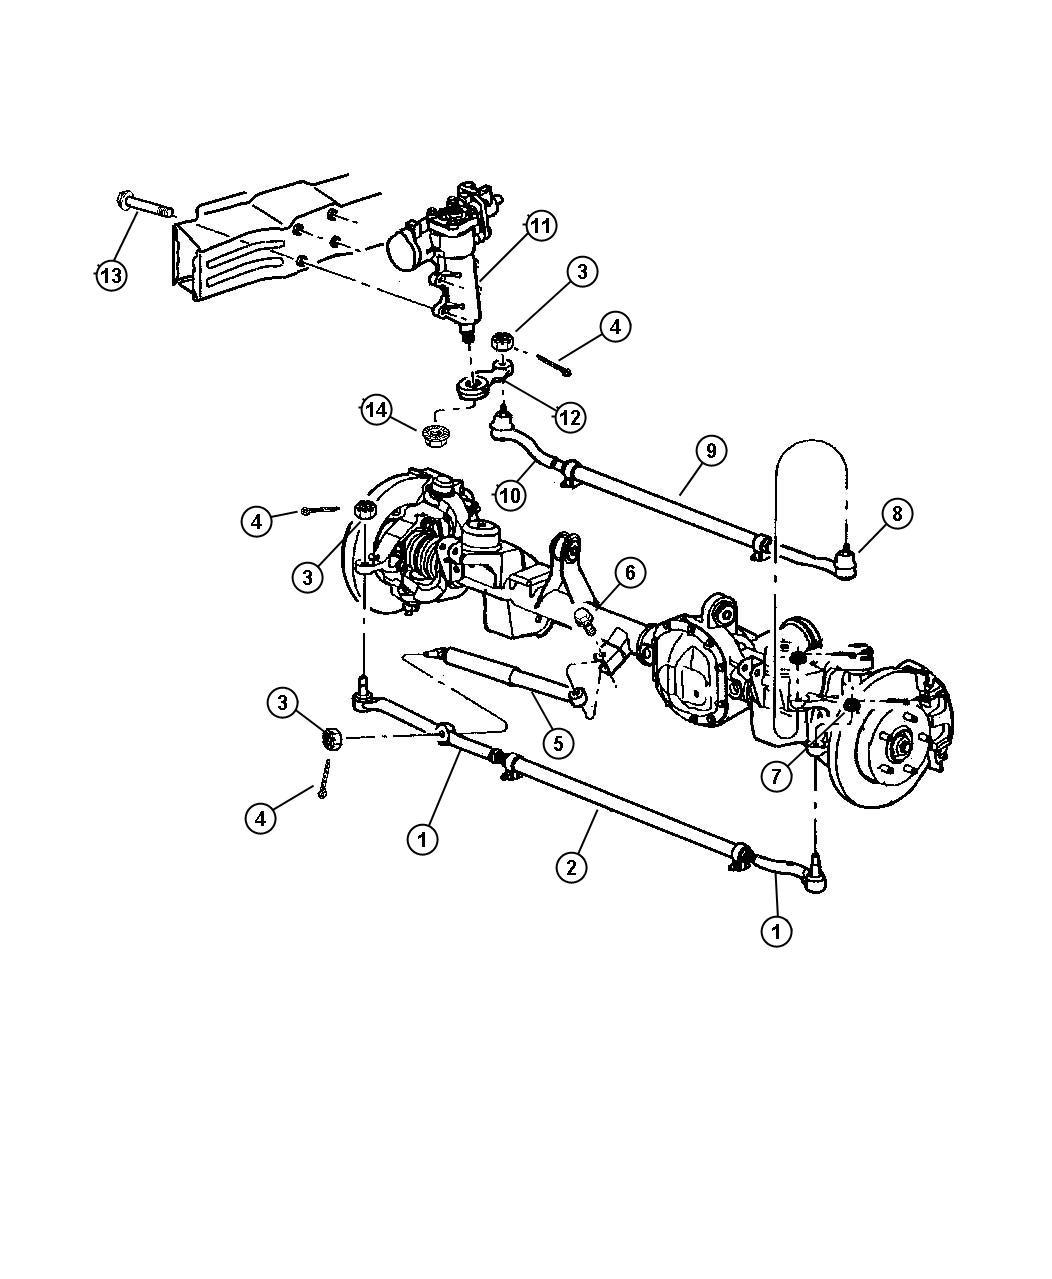 2000 Jeep Grand Cherokee Socket. Tie rod. Drag link to